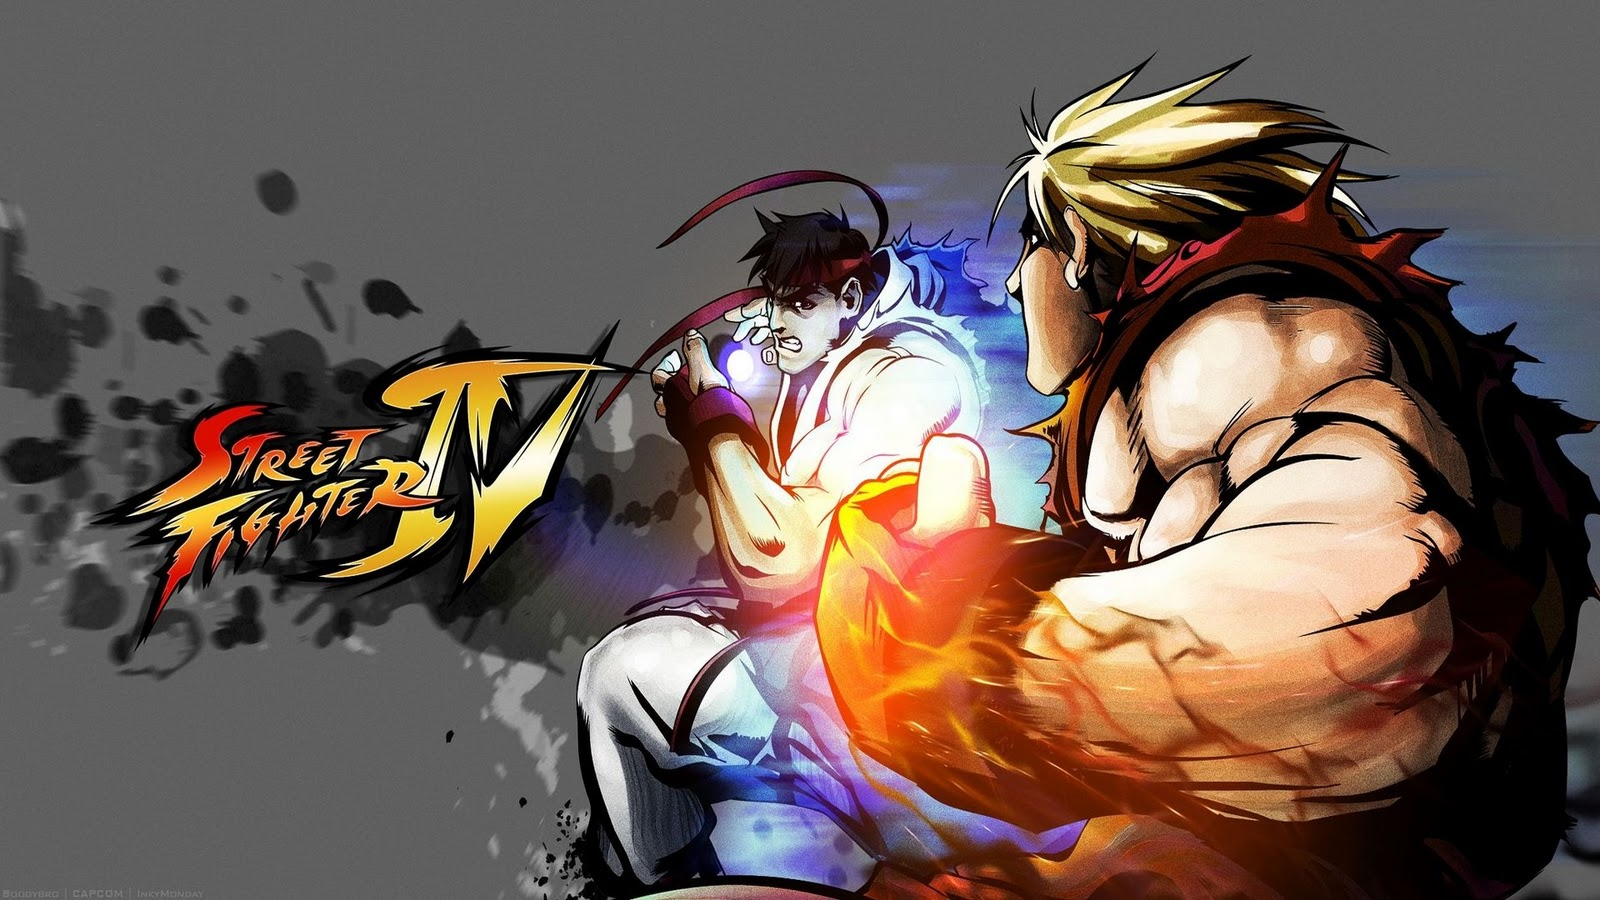 http://2.bp.blogspot.com/-TN2ls-dQyv8/TwZgr85GE7I/AAAAAAAAA08/xMgkzSR3Lio/s1600/street_fighter_iv_game-HD.jpg